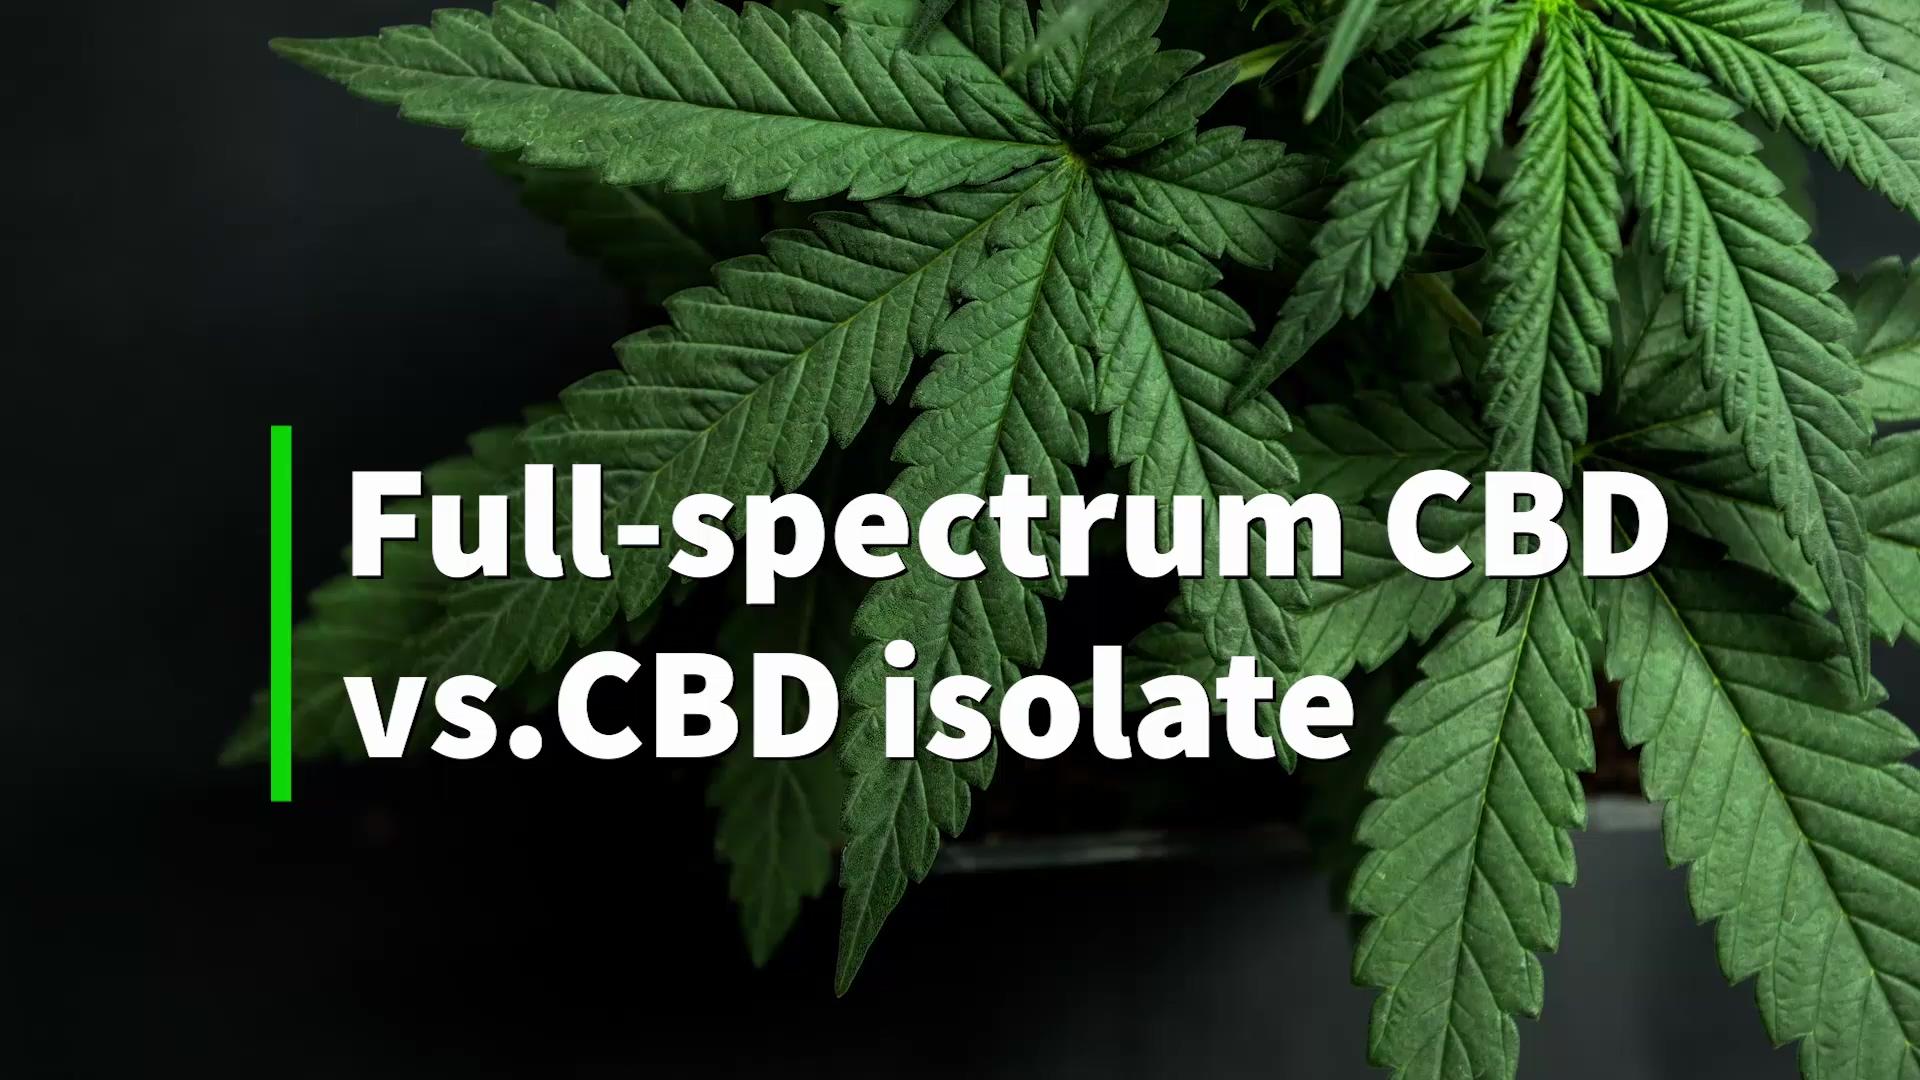 full-spectrum-cbd-vs-cbd-isolate